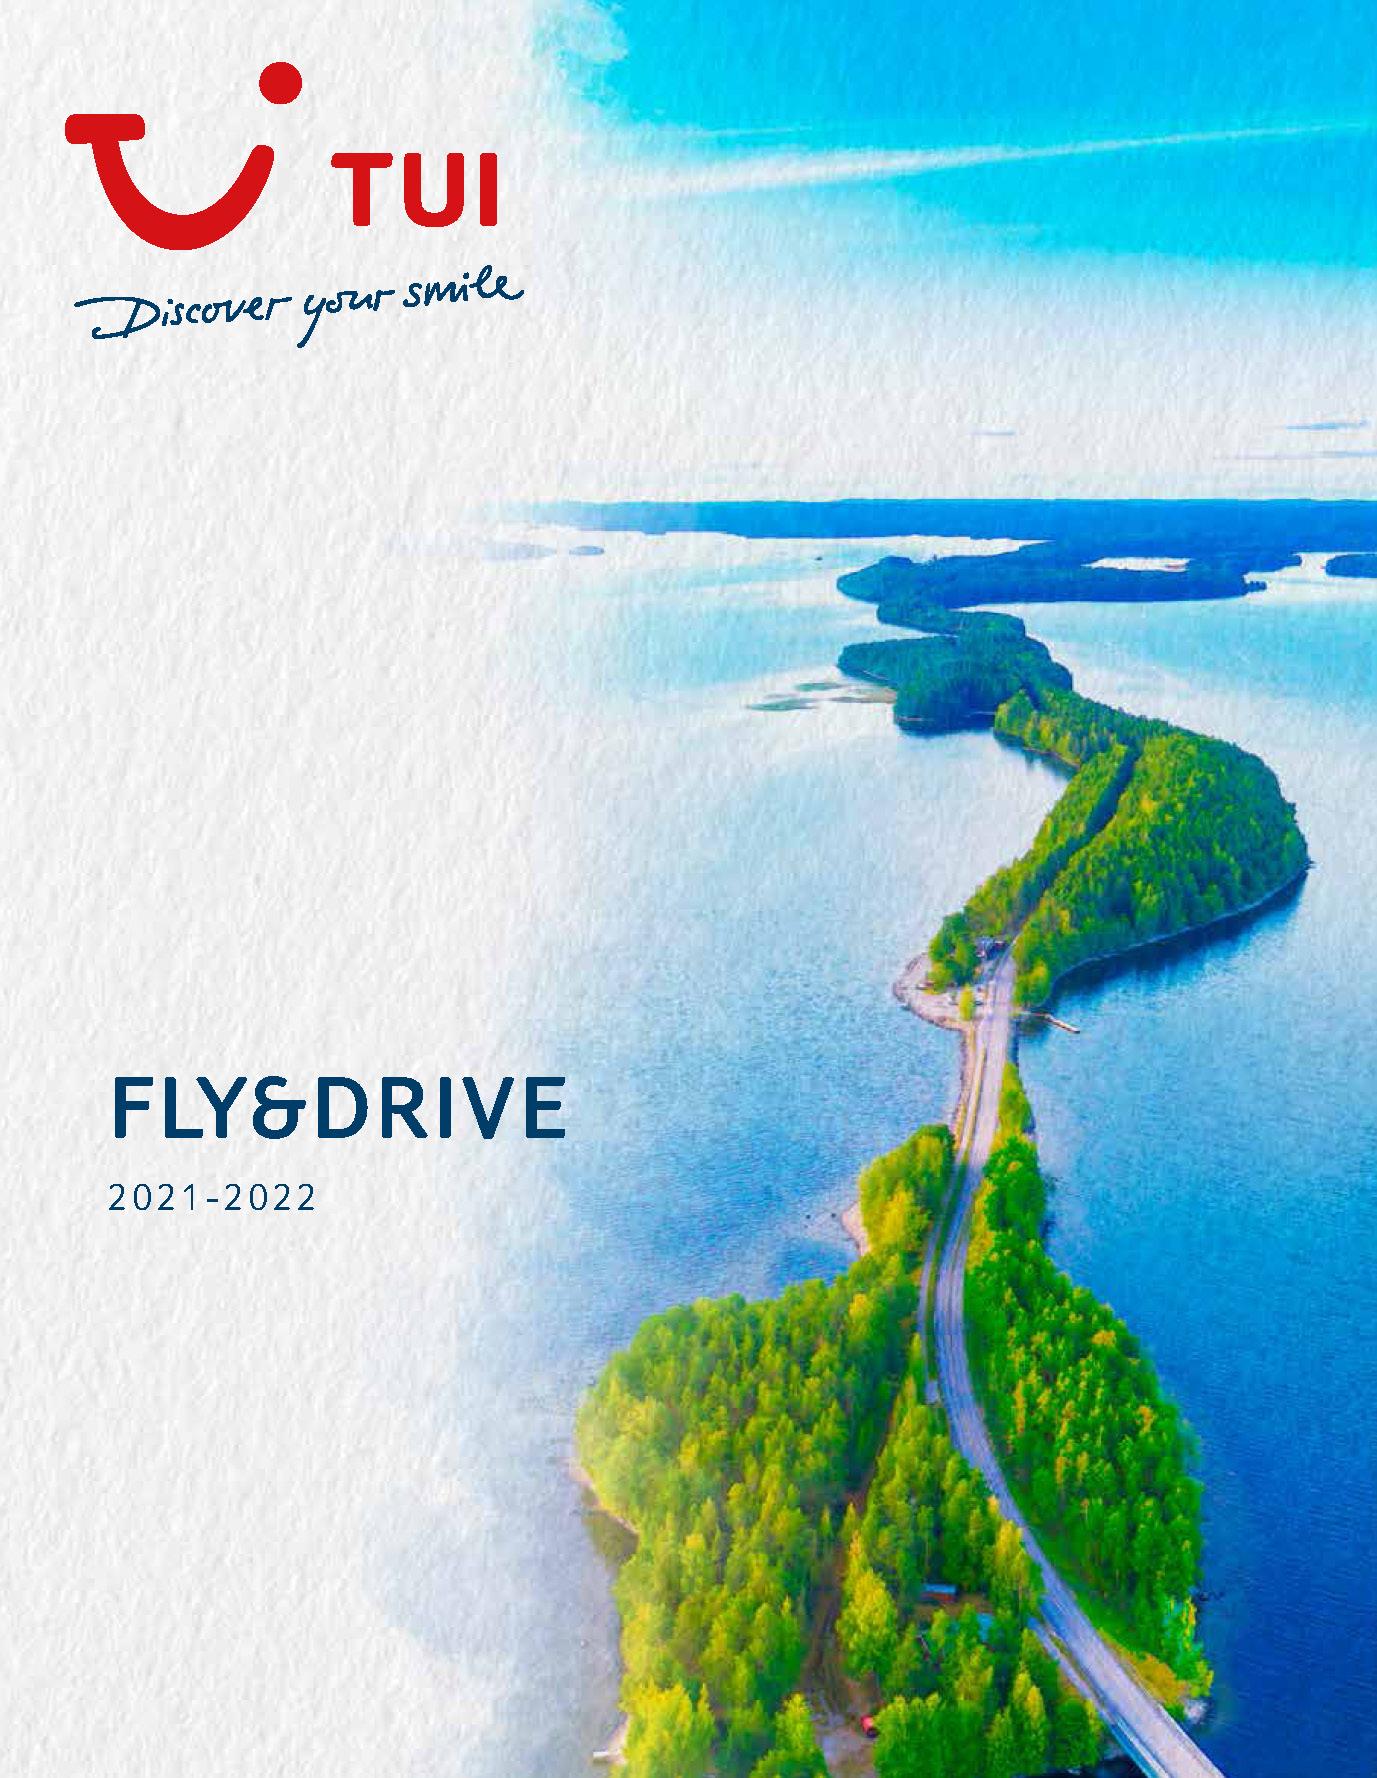 Catalogo TUI Ambassador Tours Fly and Drive 2021-2022